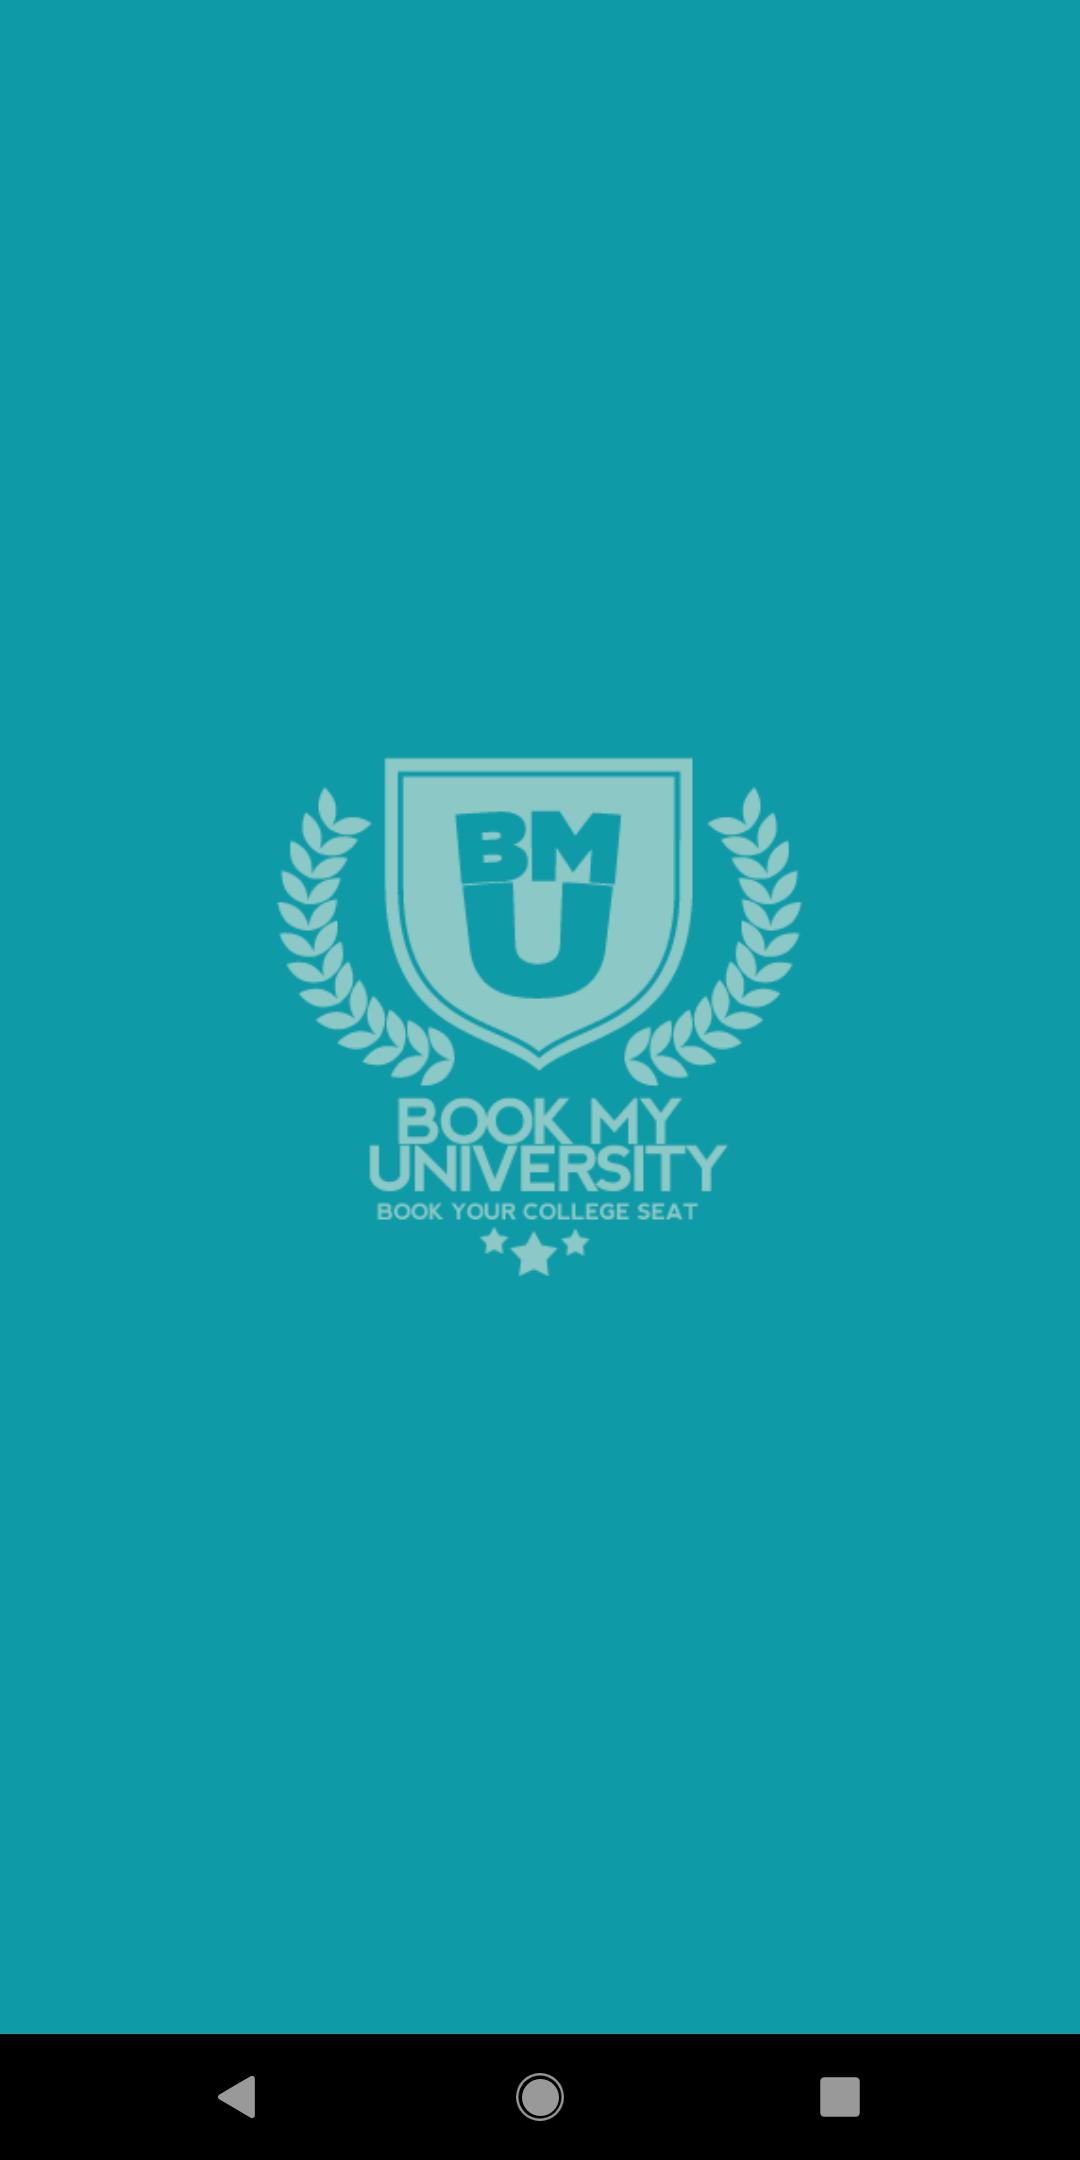 Bookmyuniversity